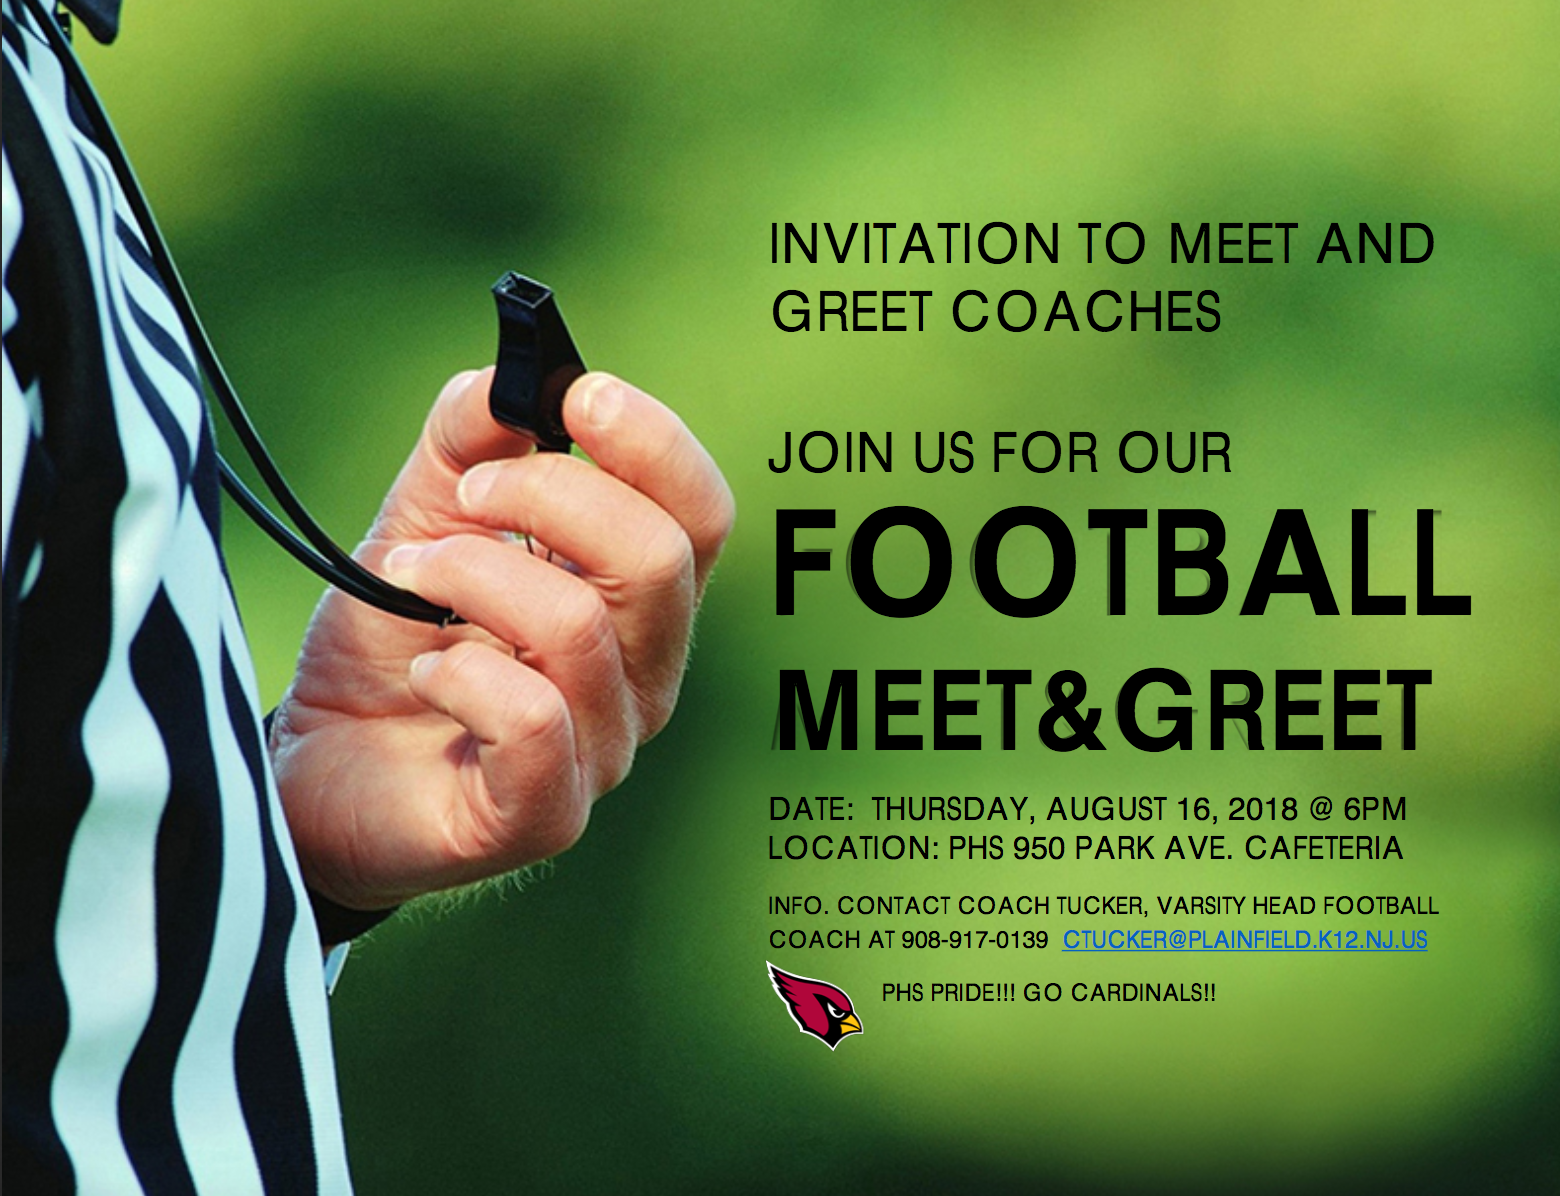 Plainfield Football Coaches to Hold Meet & Greet